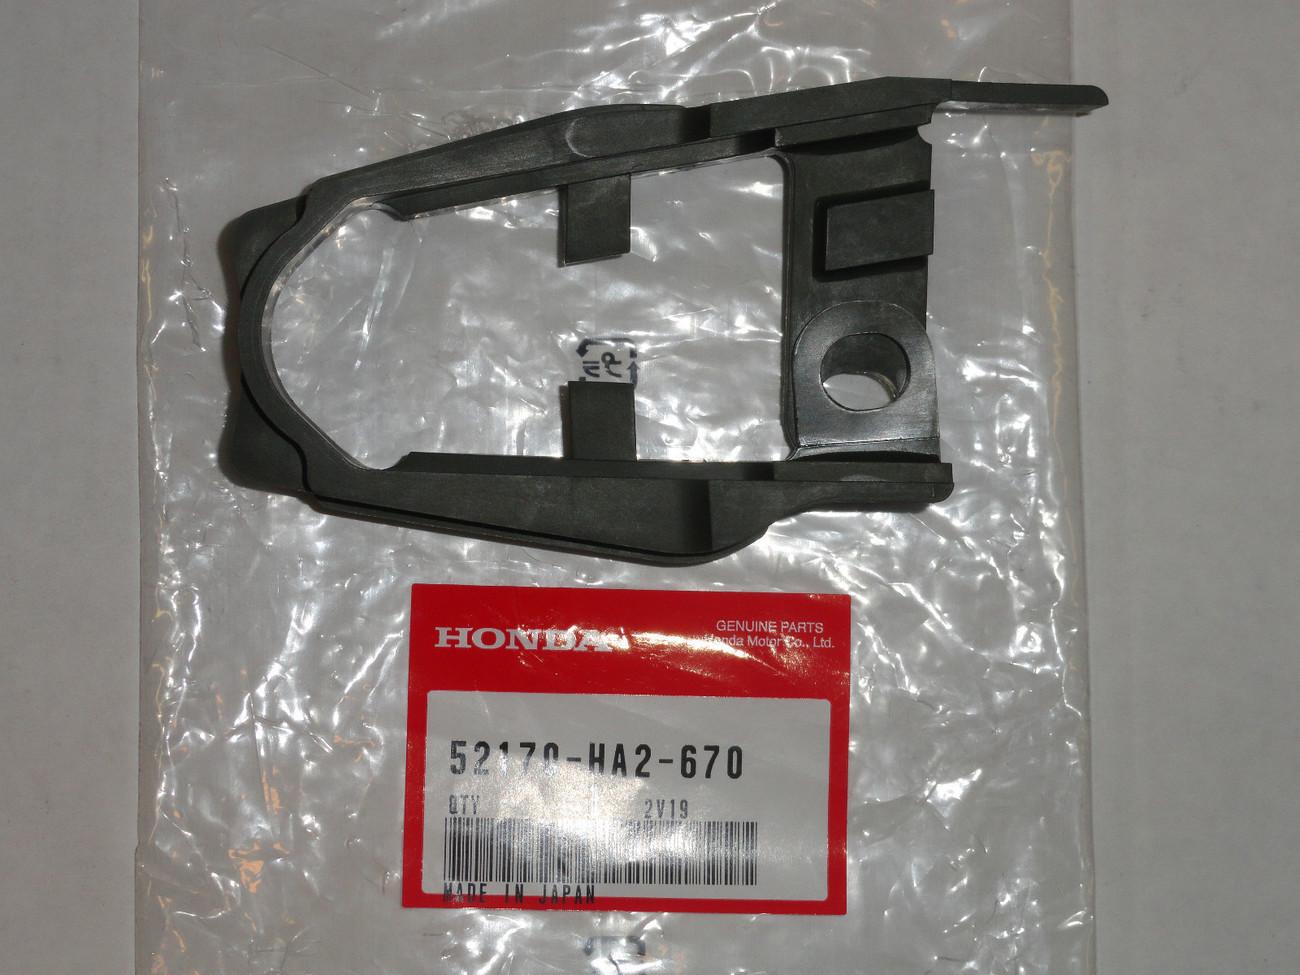 Chain Slider Buffer Guide Honda ATC250R TRX250R ATC250 TRX250 ATC TRX 250R 250 R